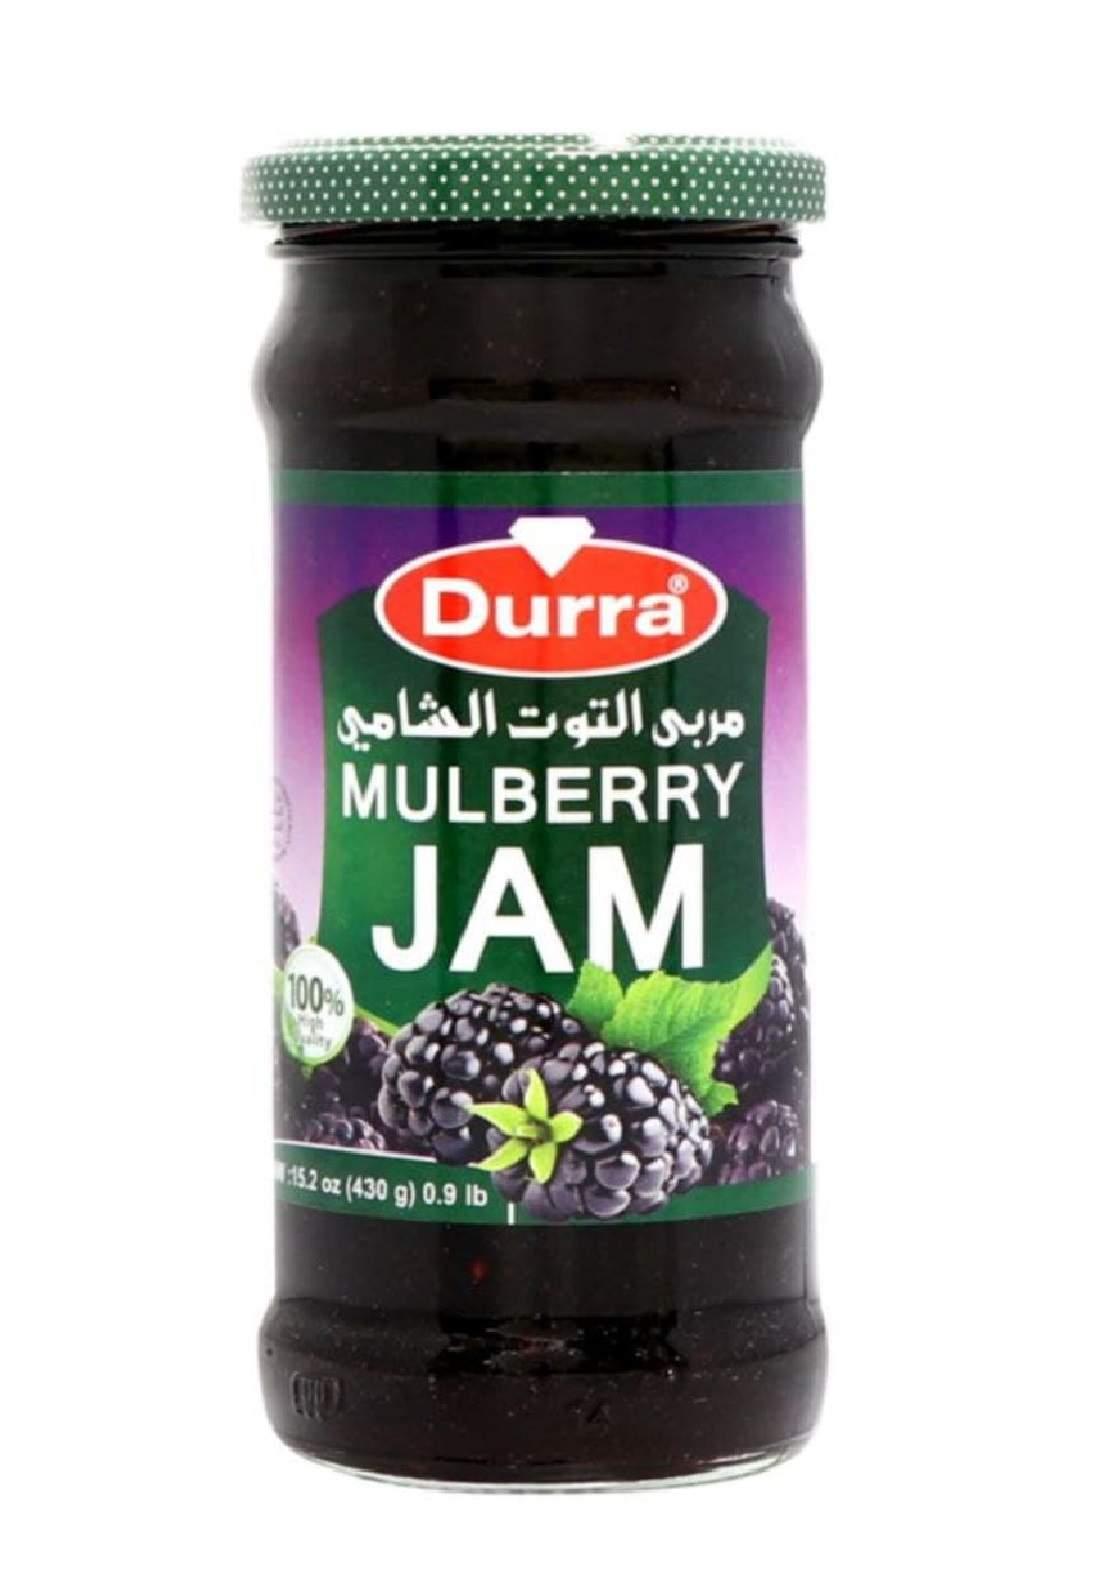 Mulberry jam 430g مربى التوت الشامي